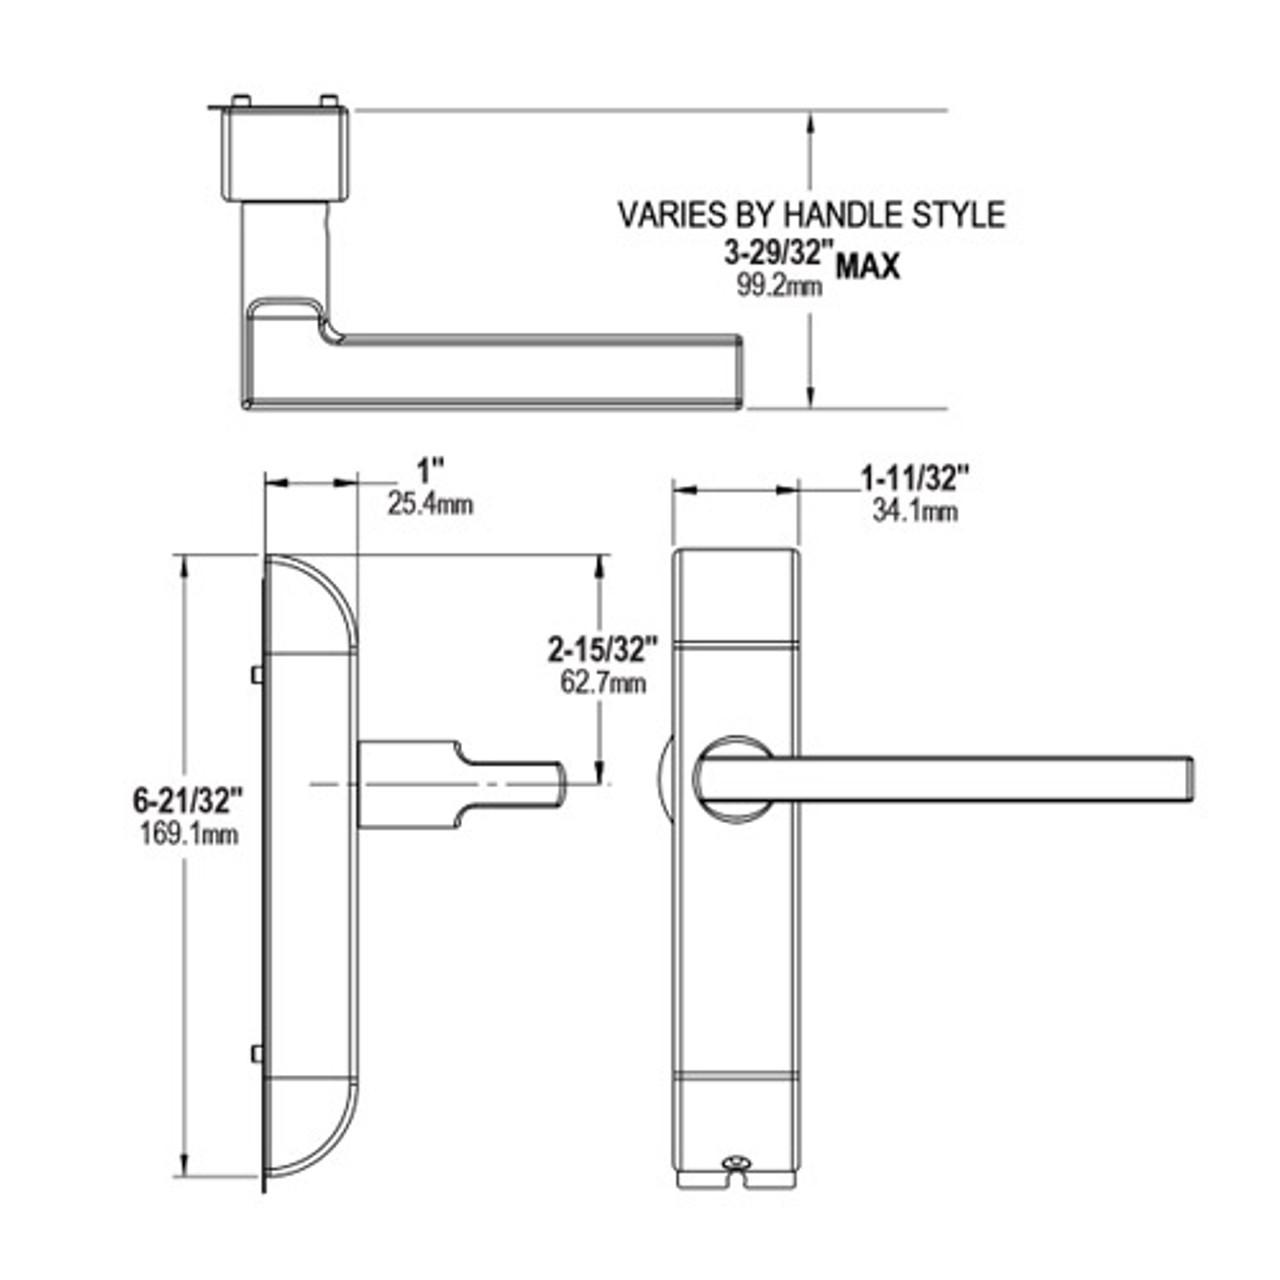 4600M-MD-551-US32D Adams Rite MD Designer handle Dimensional View